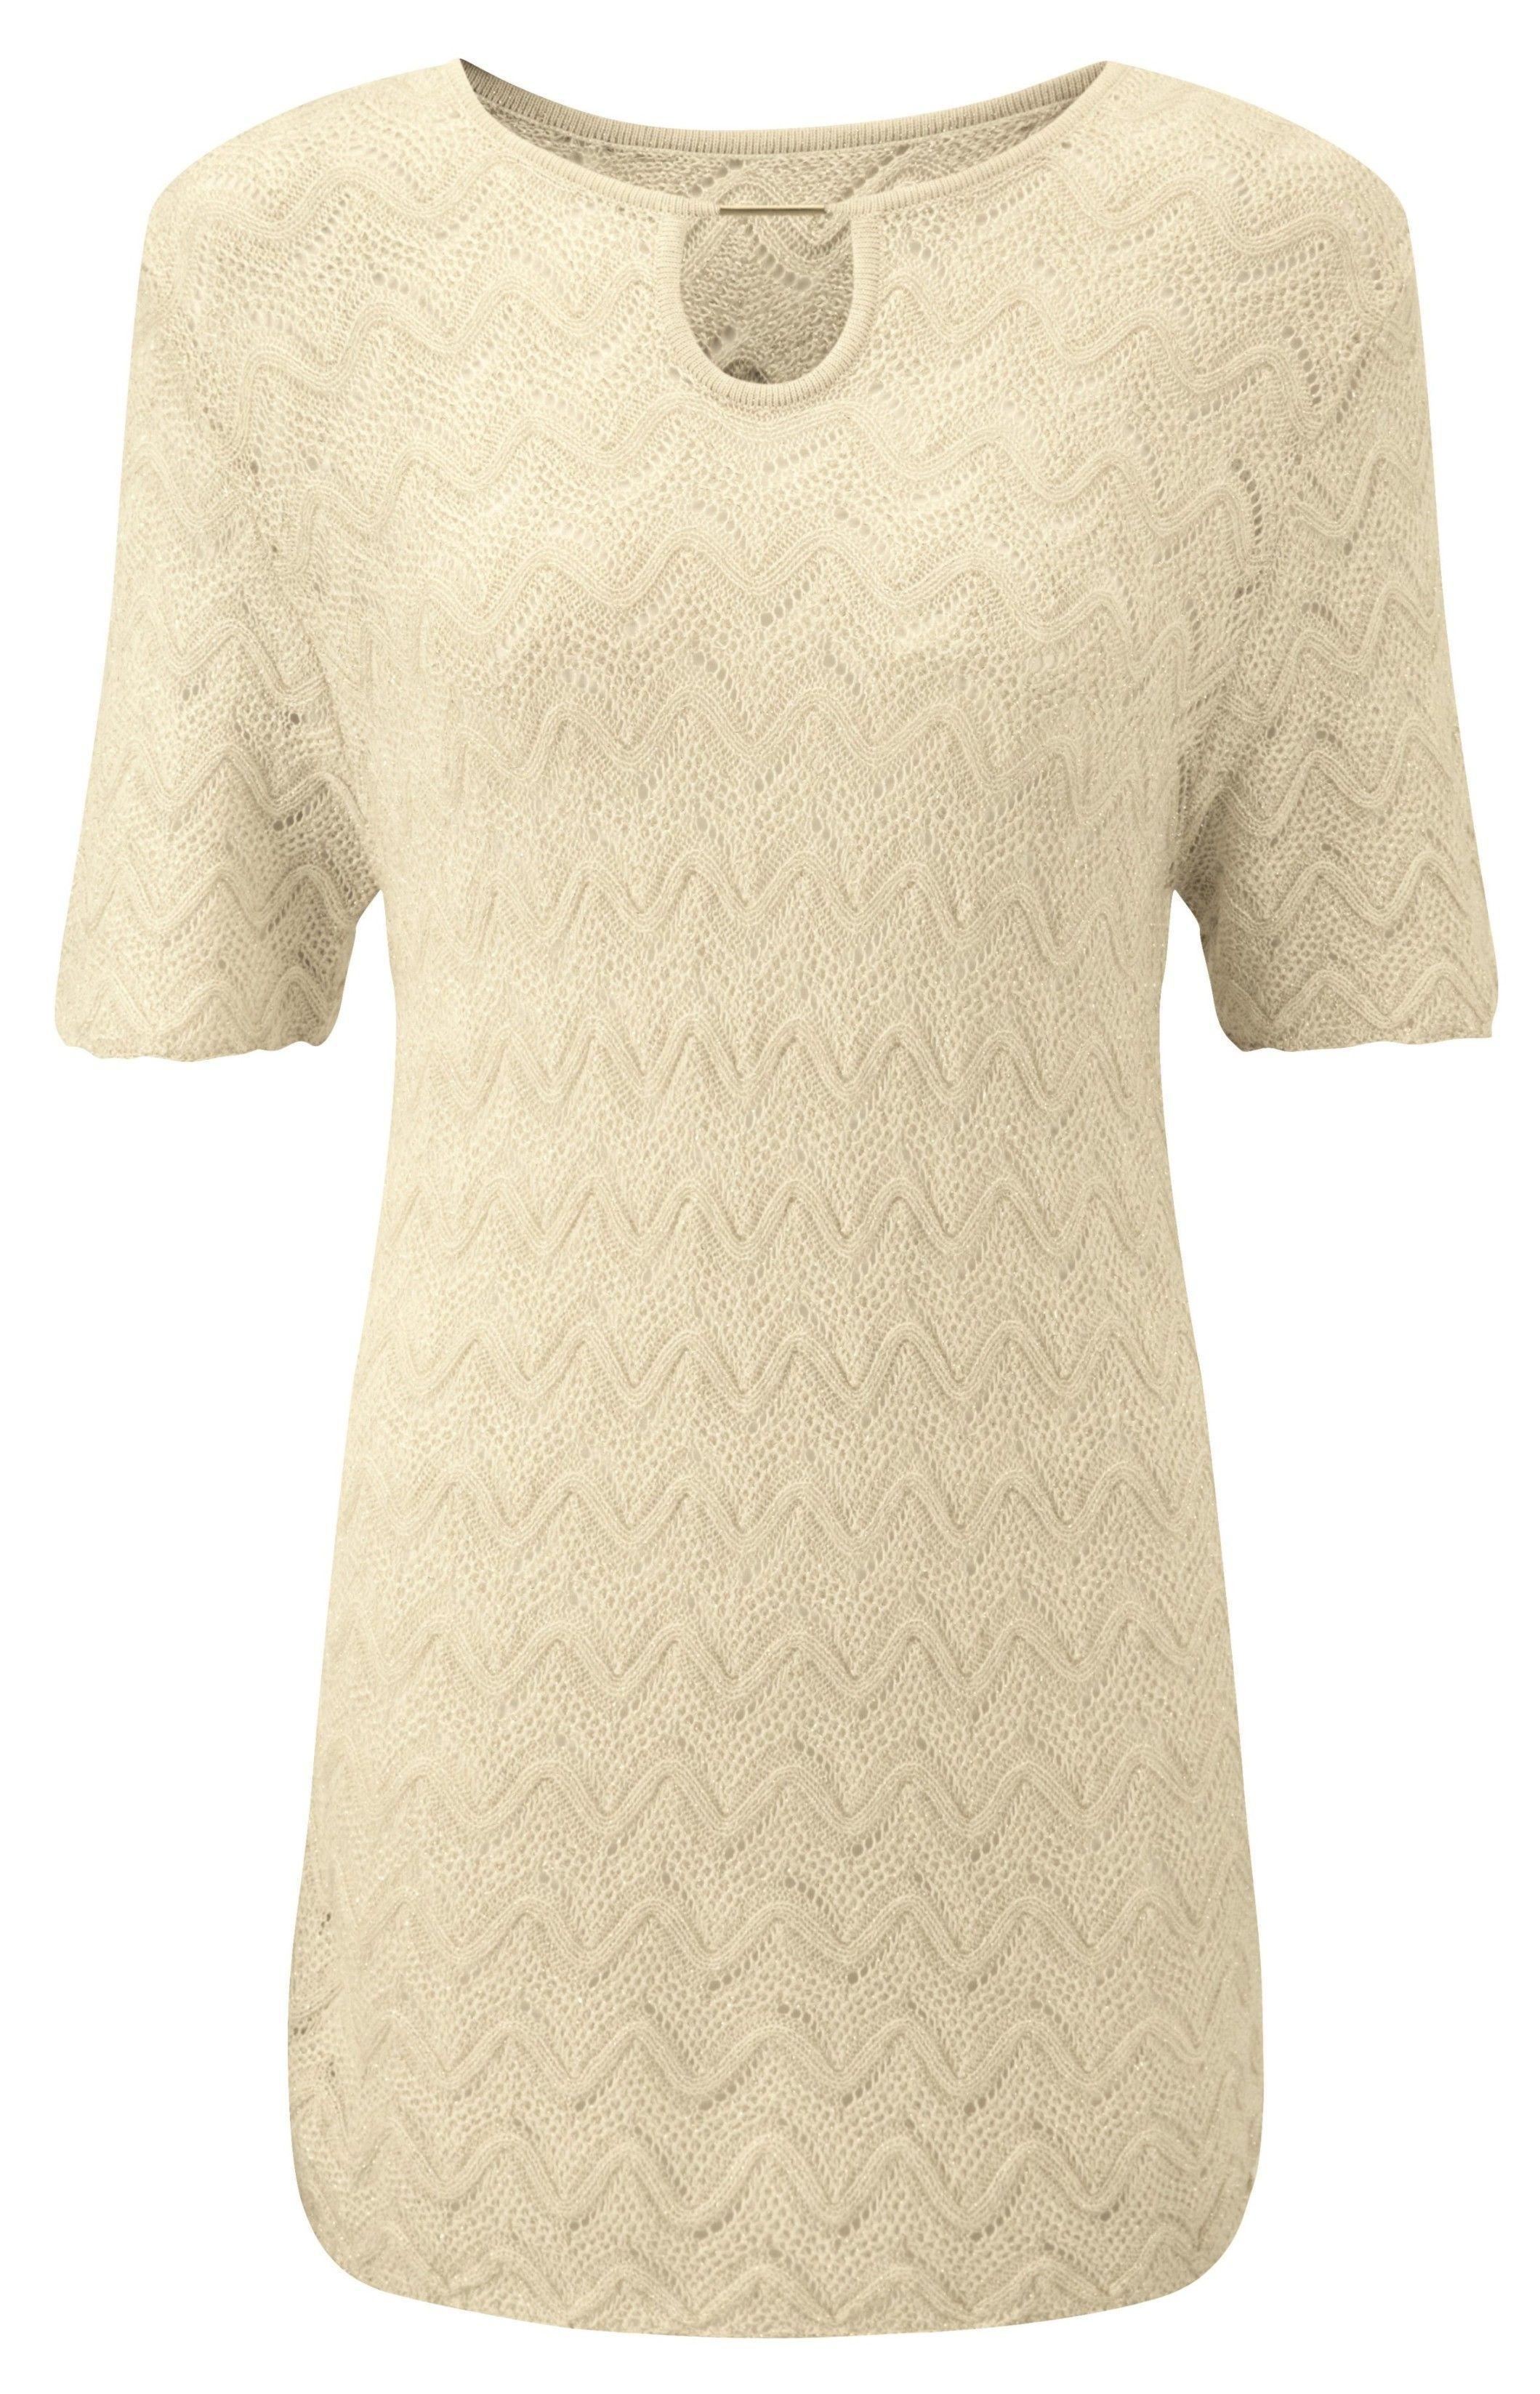 Ivory Tunic Product Code W797 Www Damart Co Uk Sweaters Fashion Sleeveless Jumper